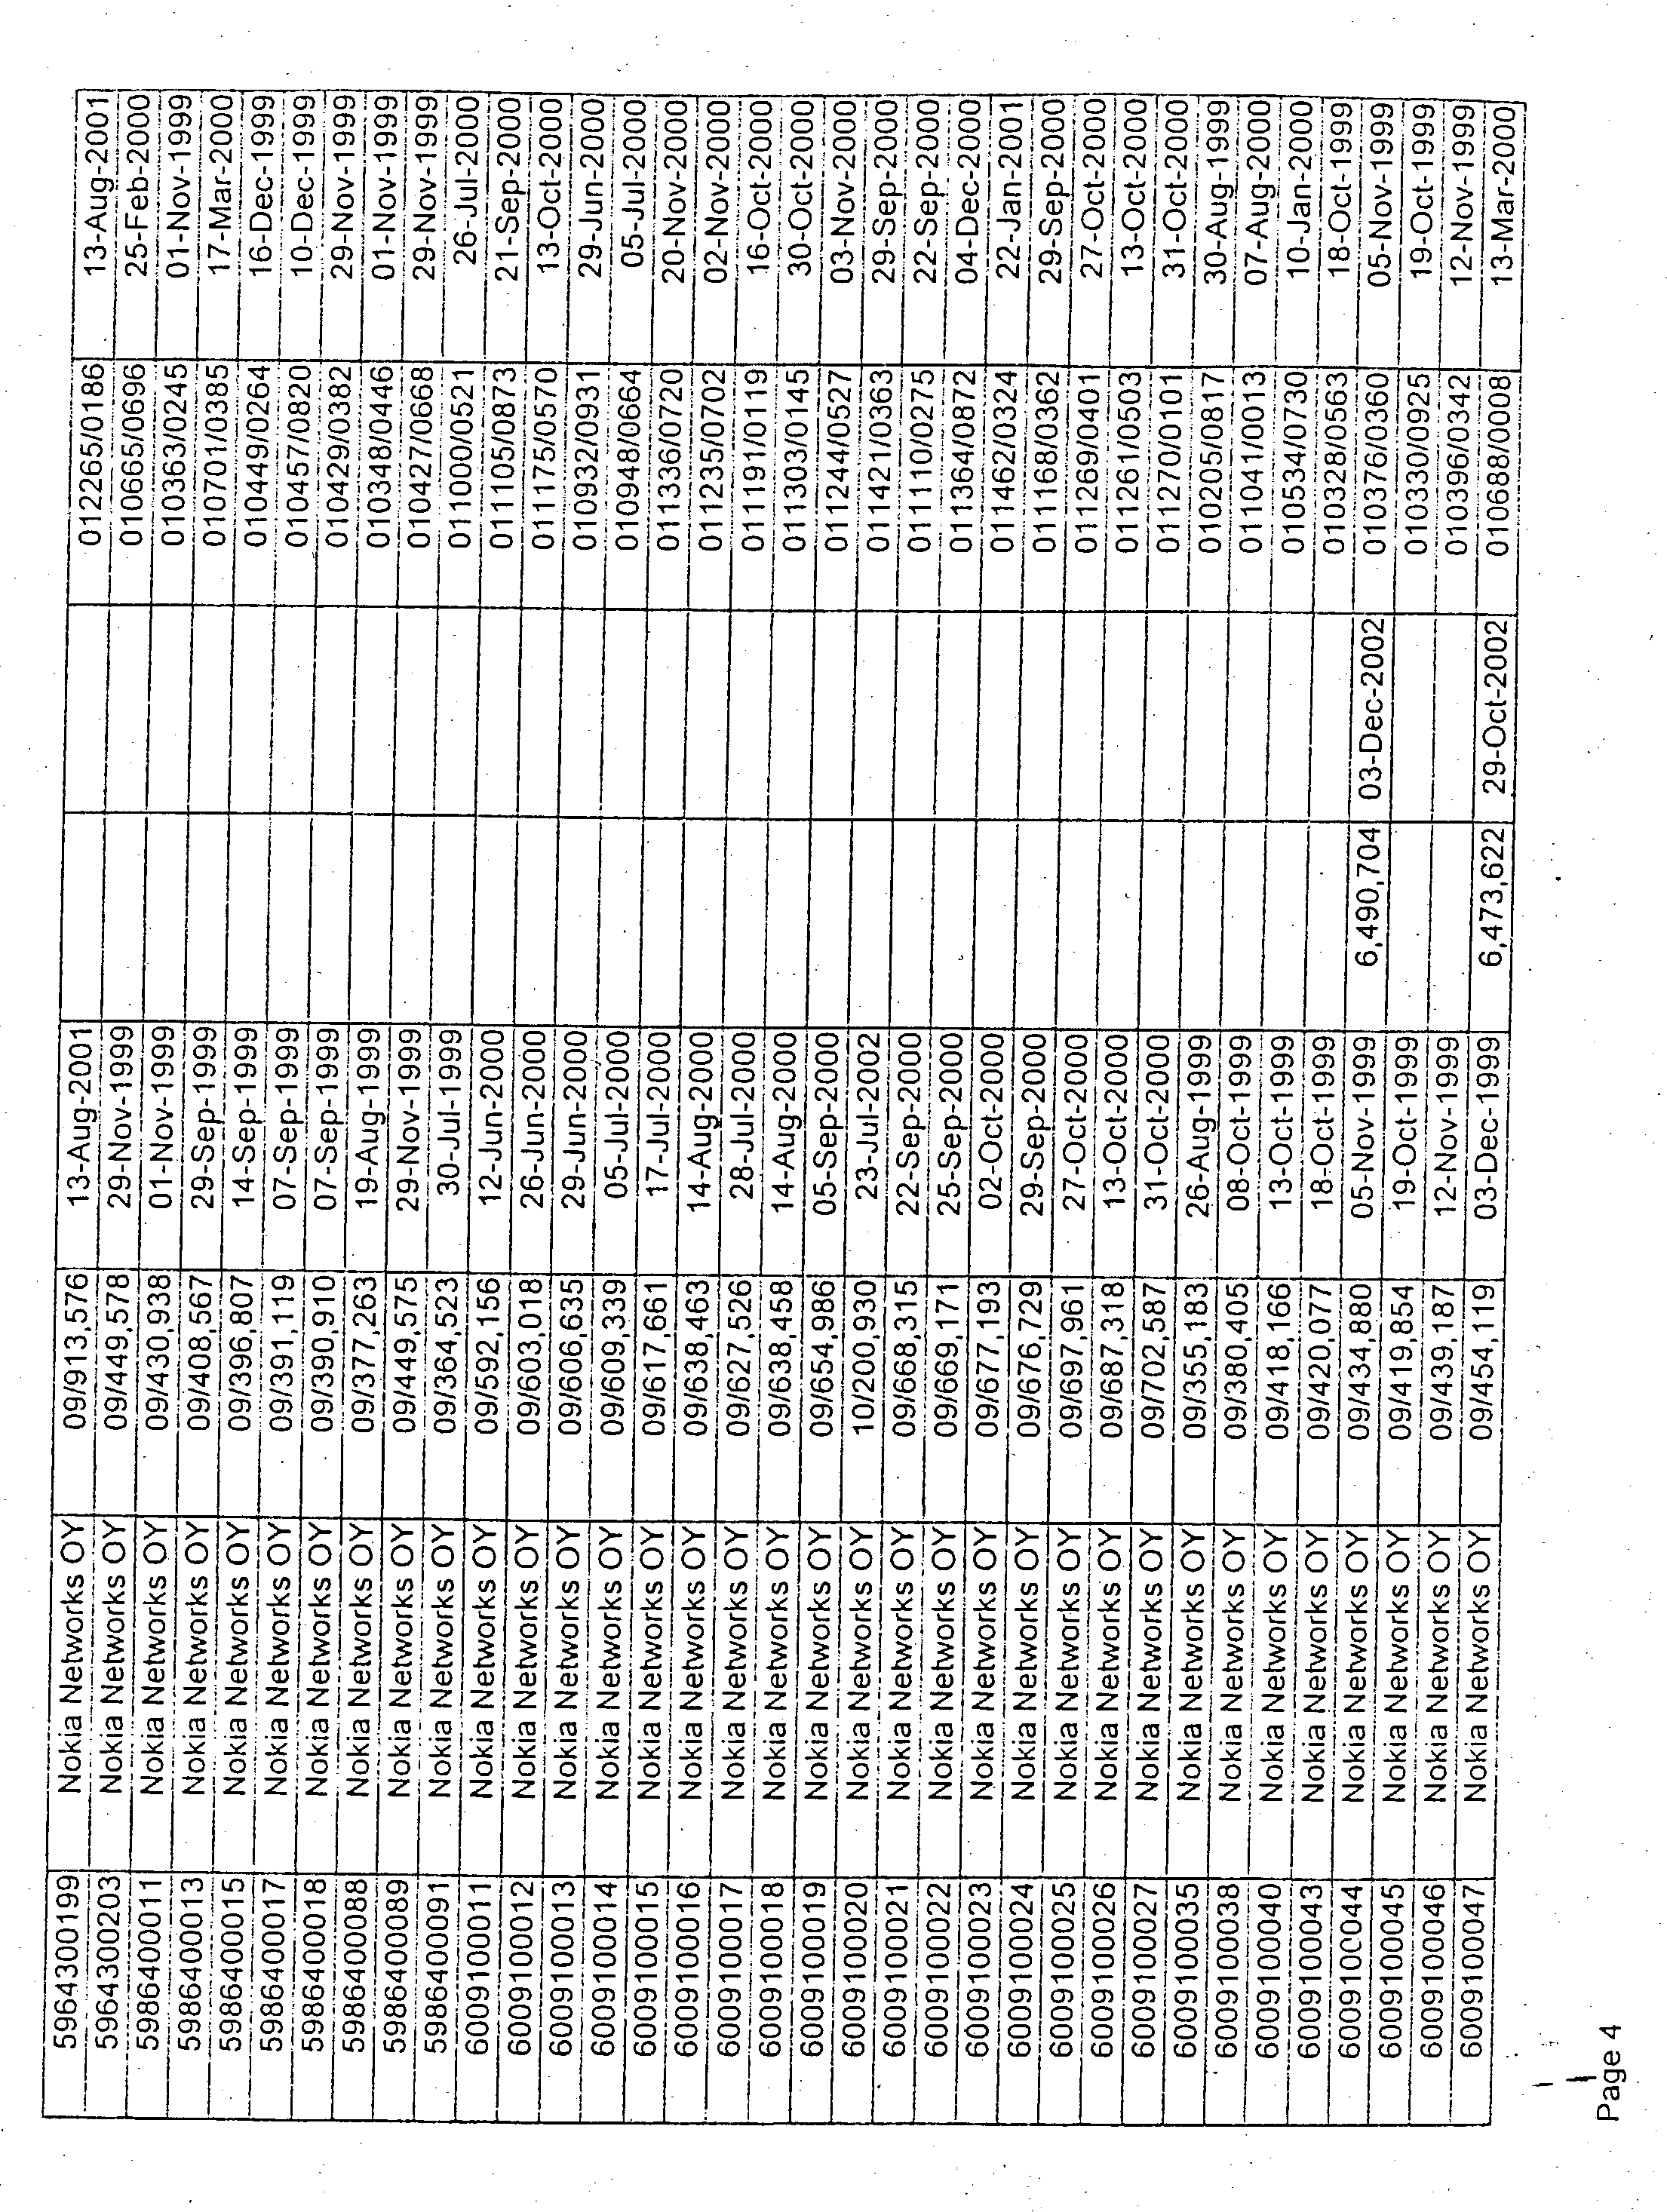 Figure US20030125024A1-20030703-P00004